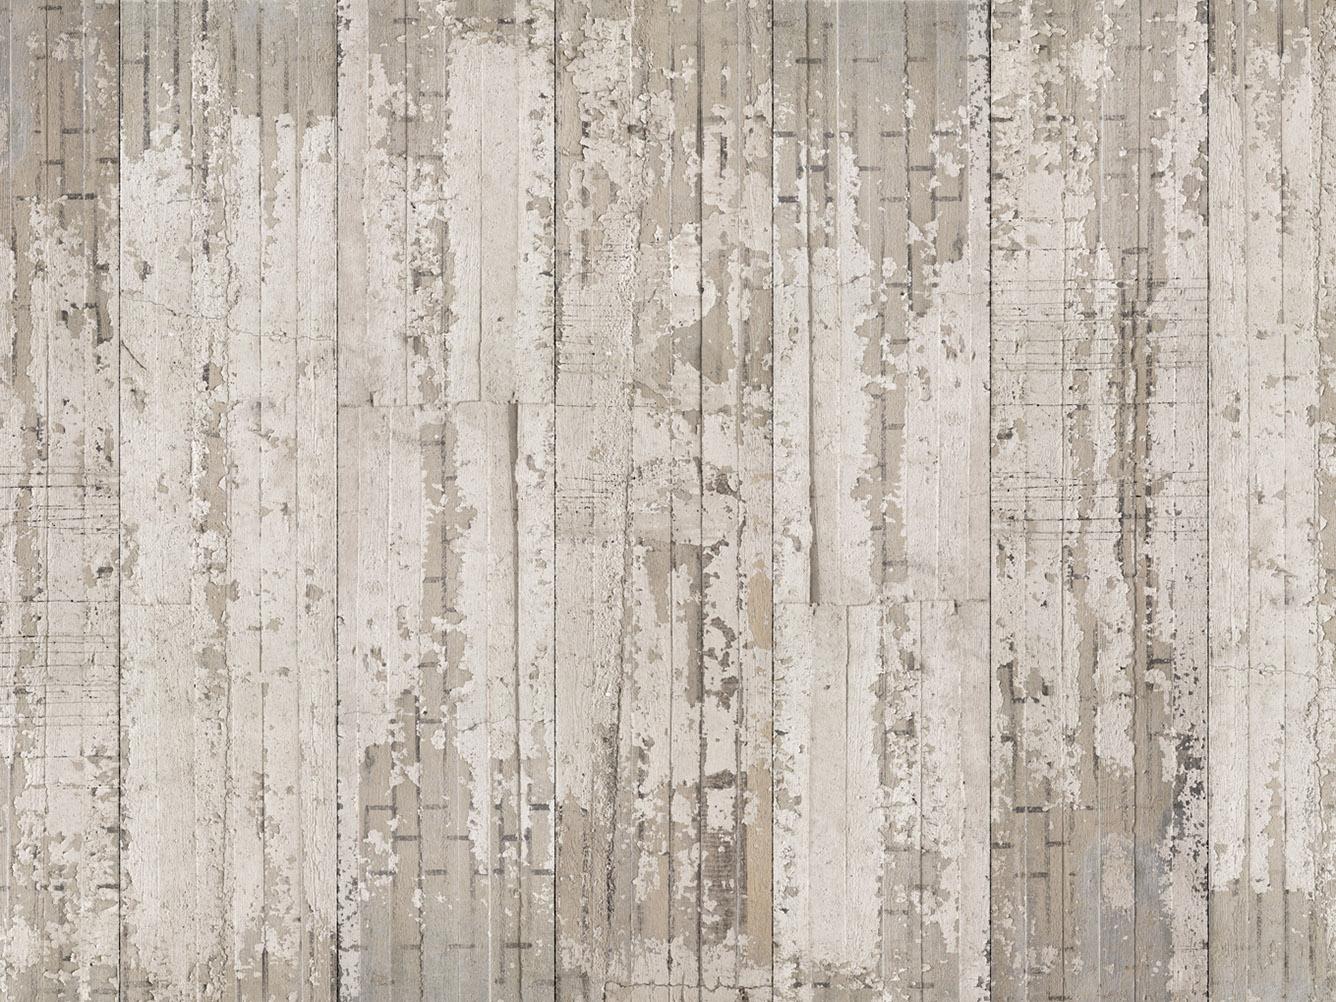 Wallpaper by NLXL